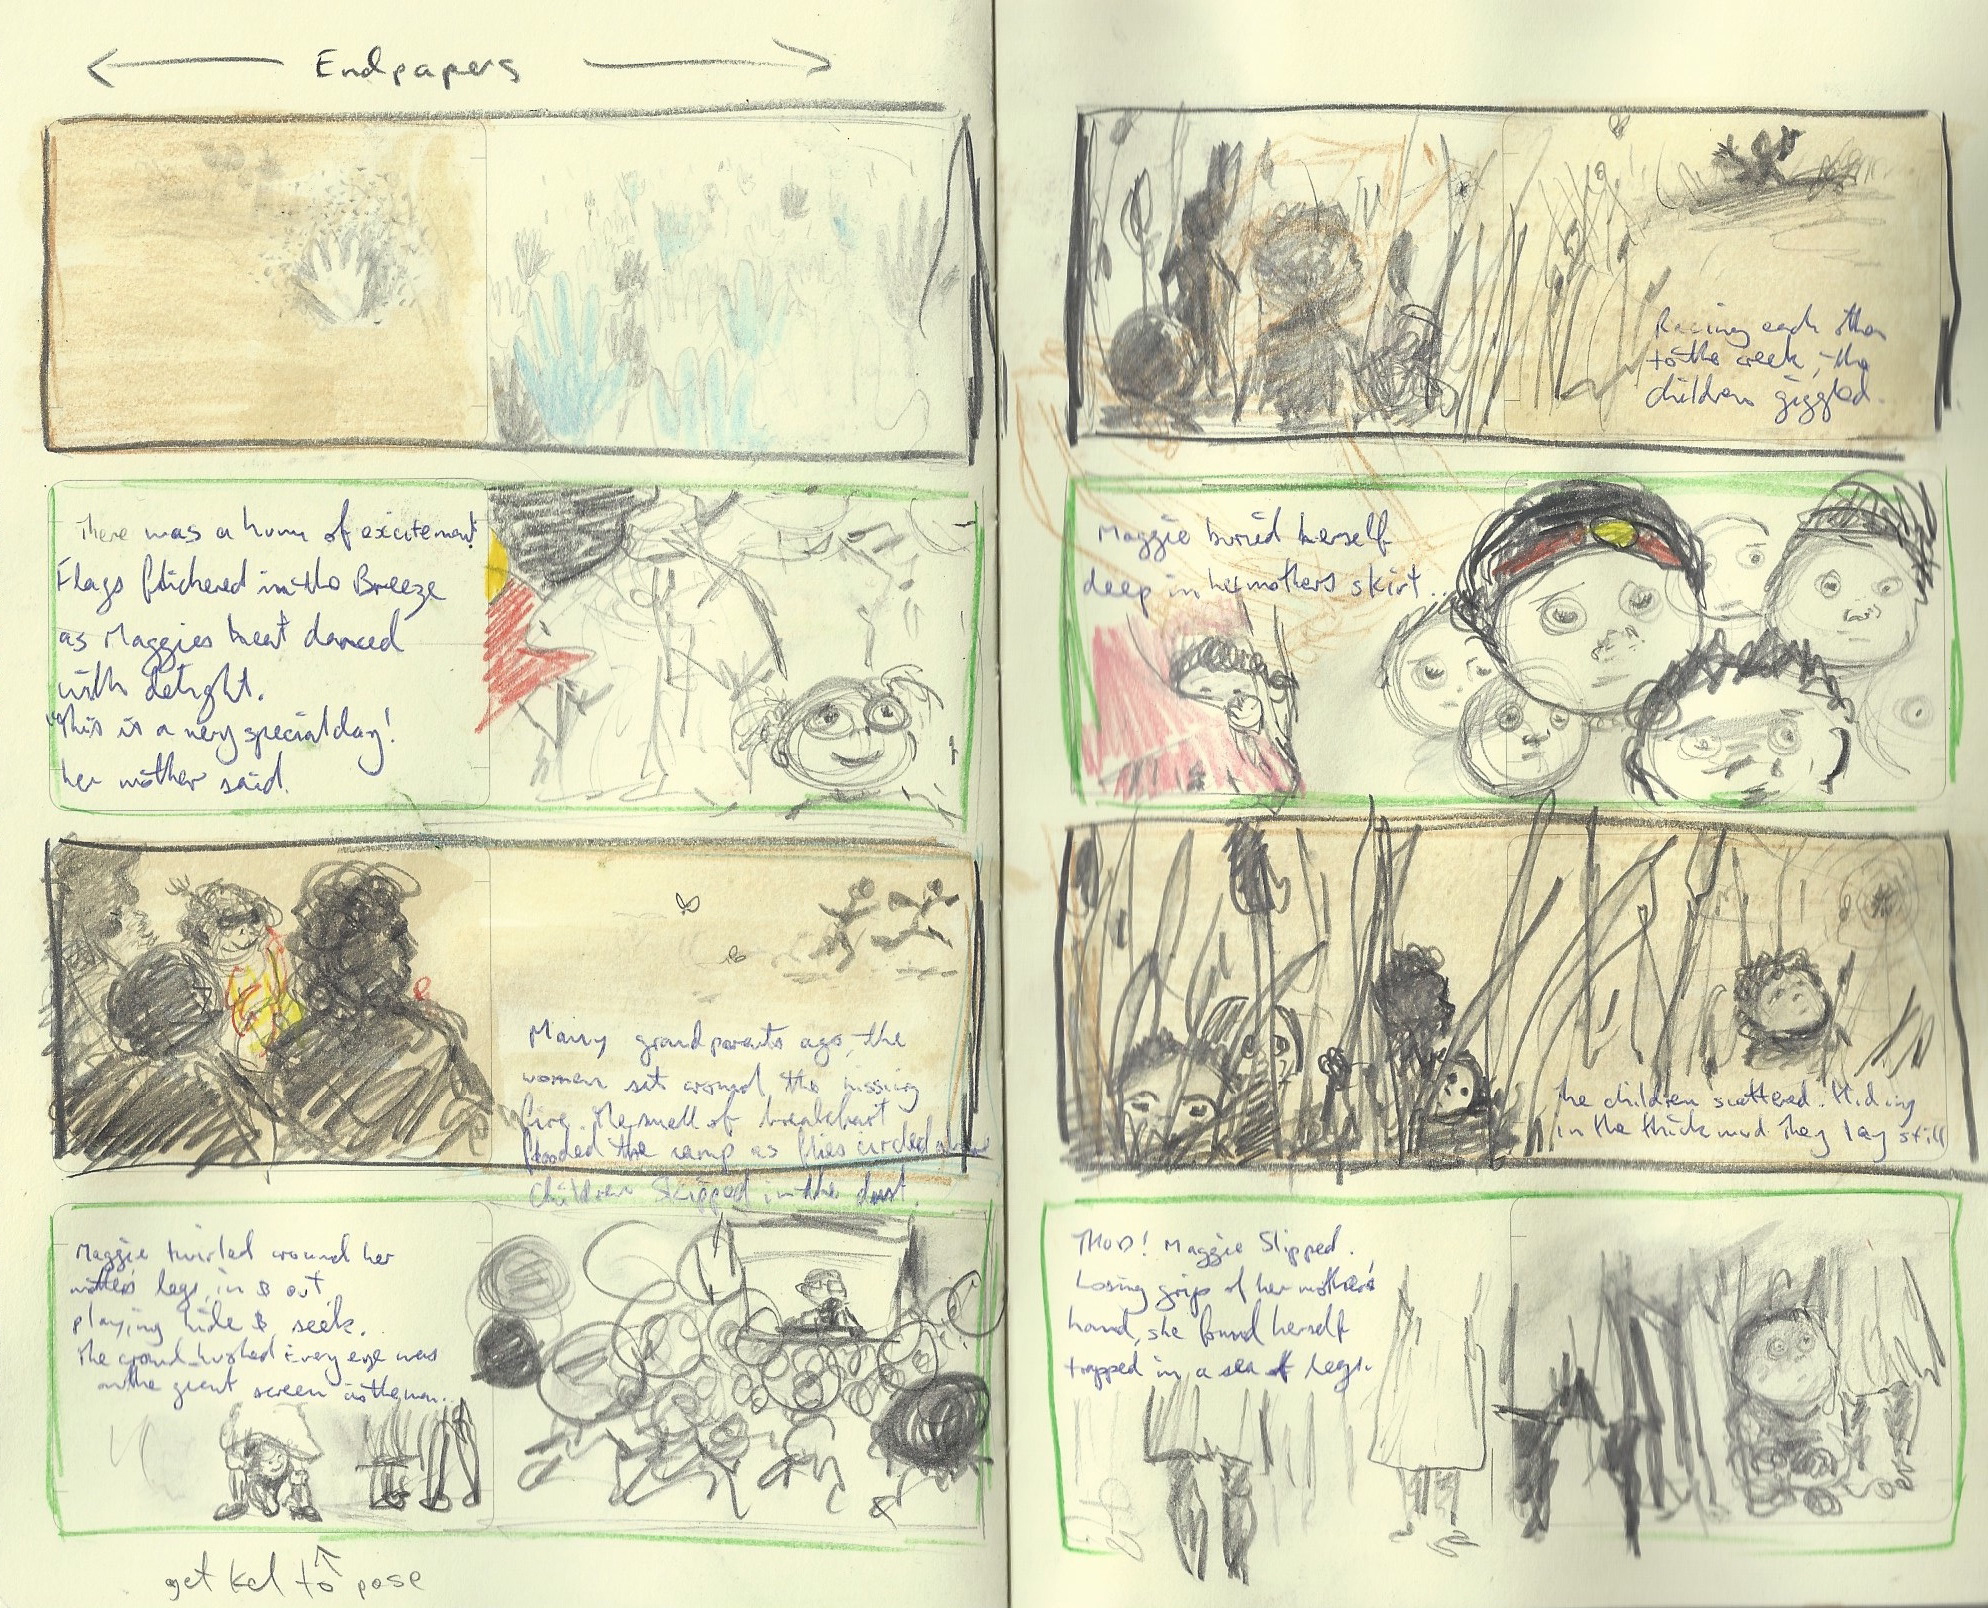 Dub Leffler's Storyboard illustrations for Sorry Day